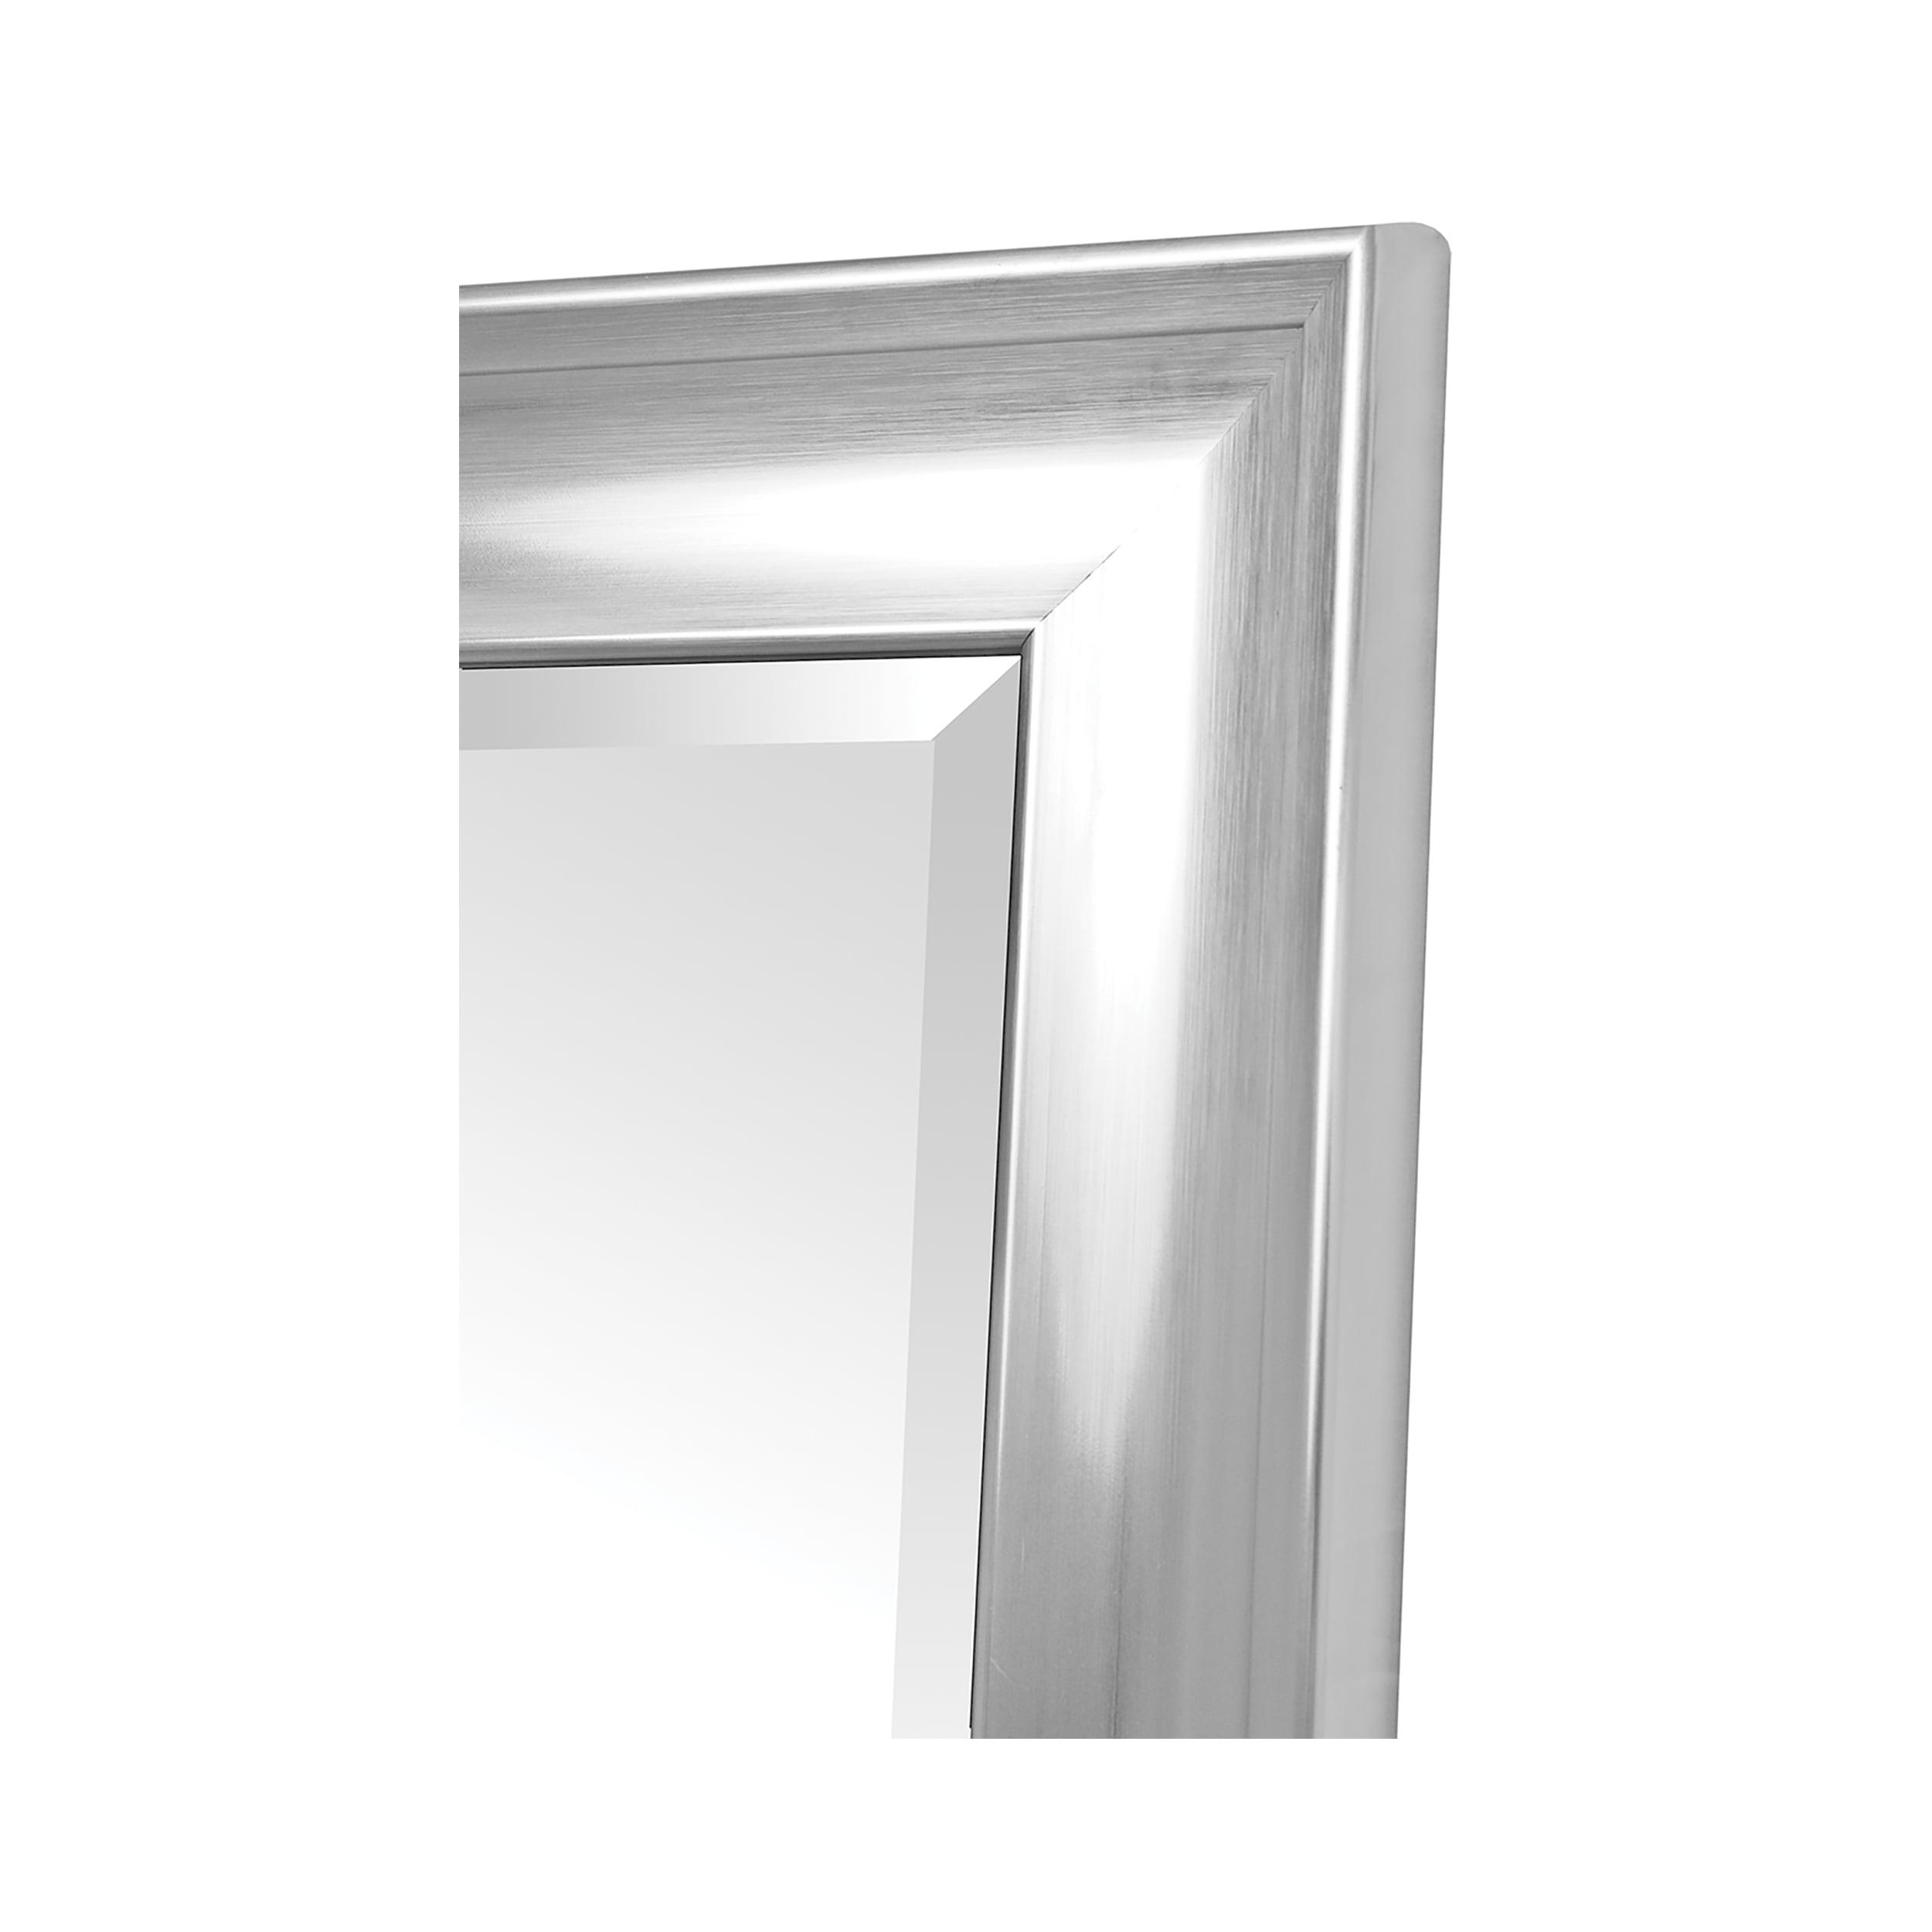 "Argento Silver Vanity (40"" x 36"")"